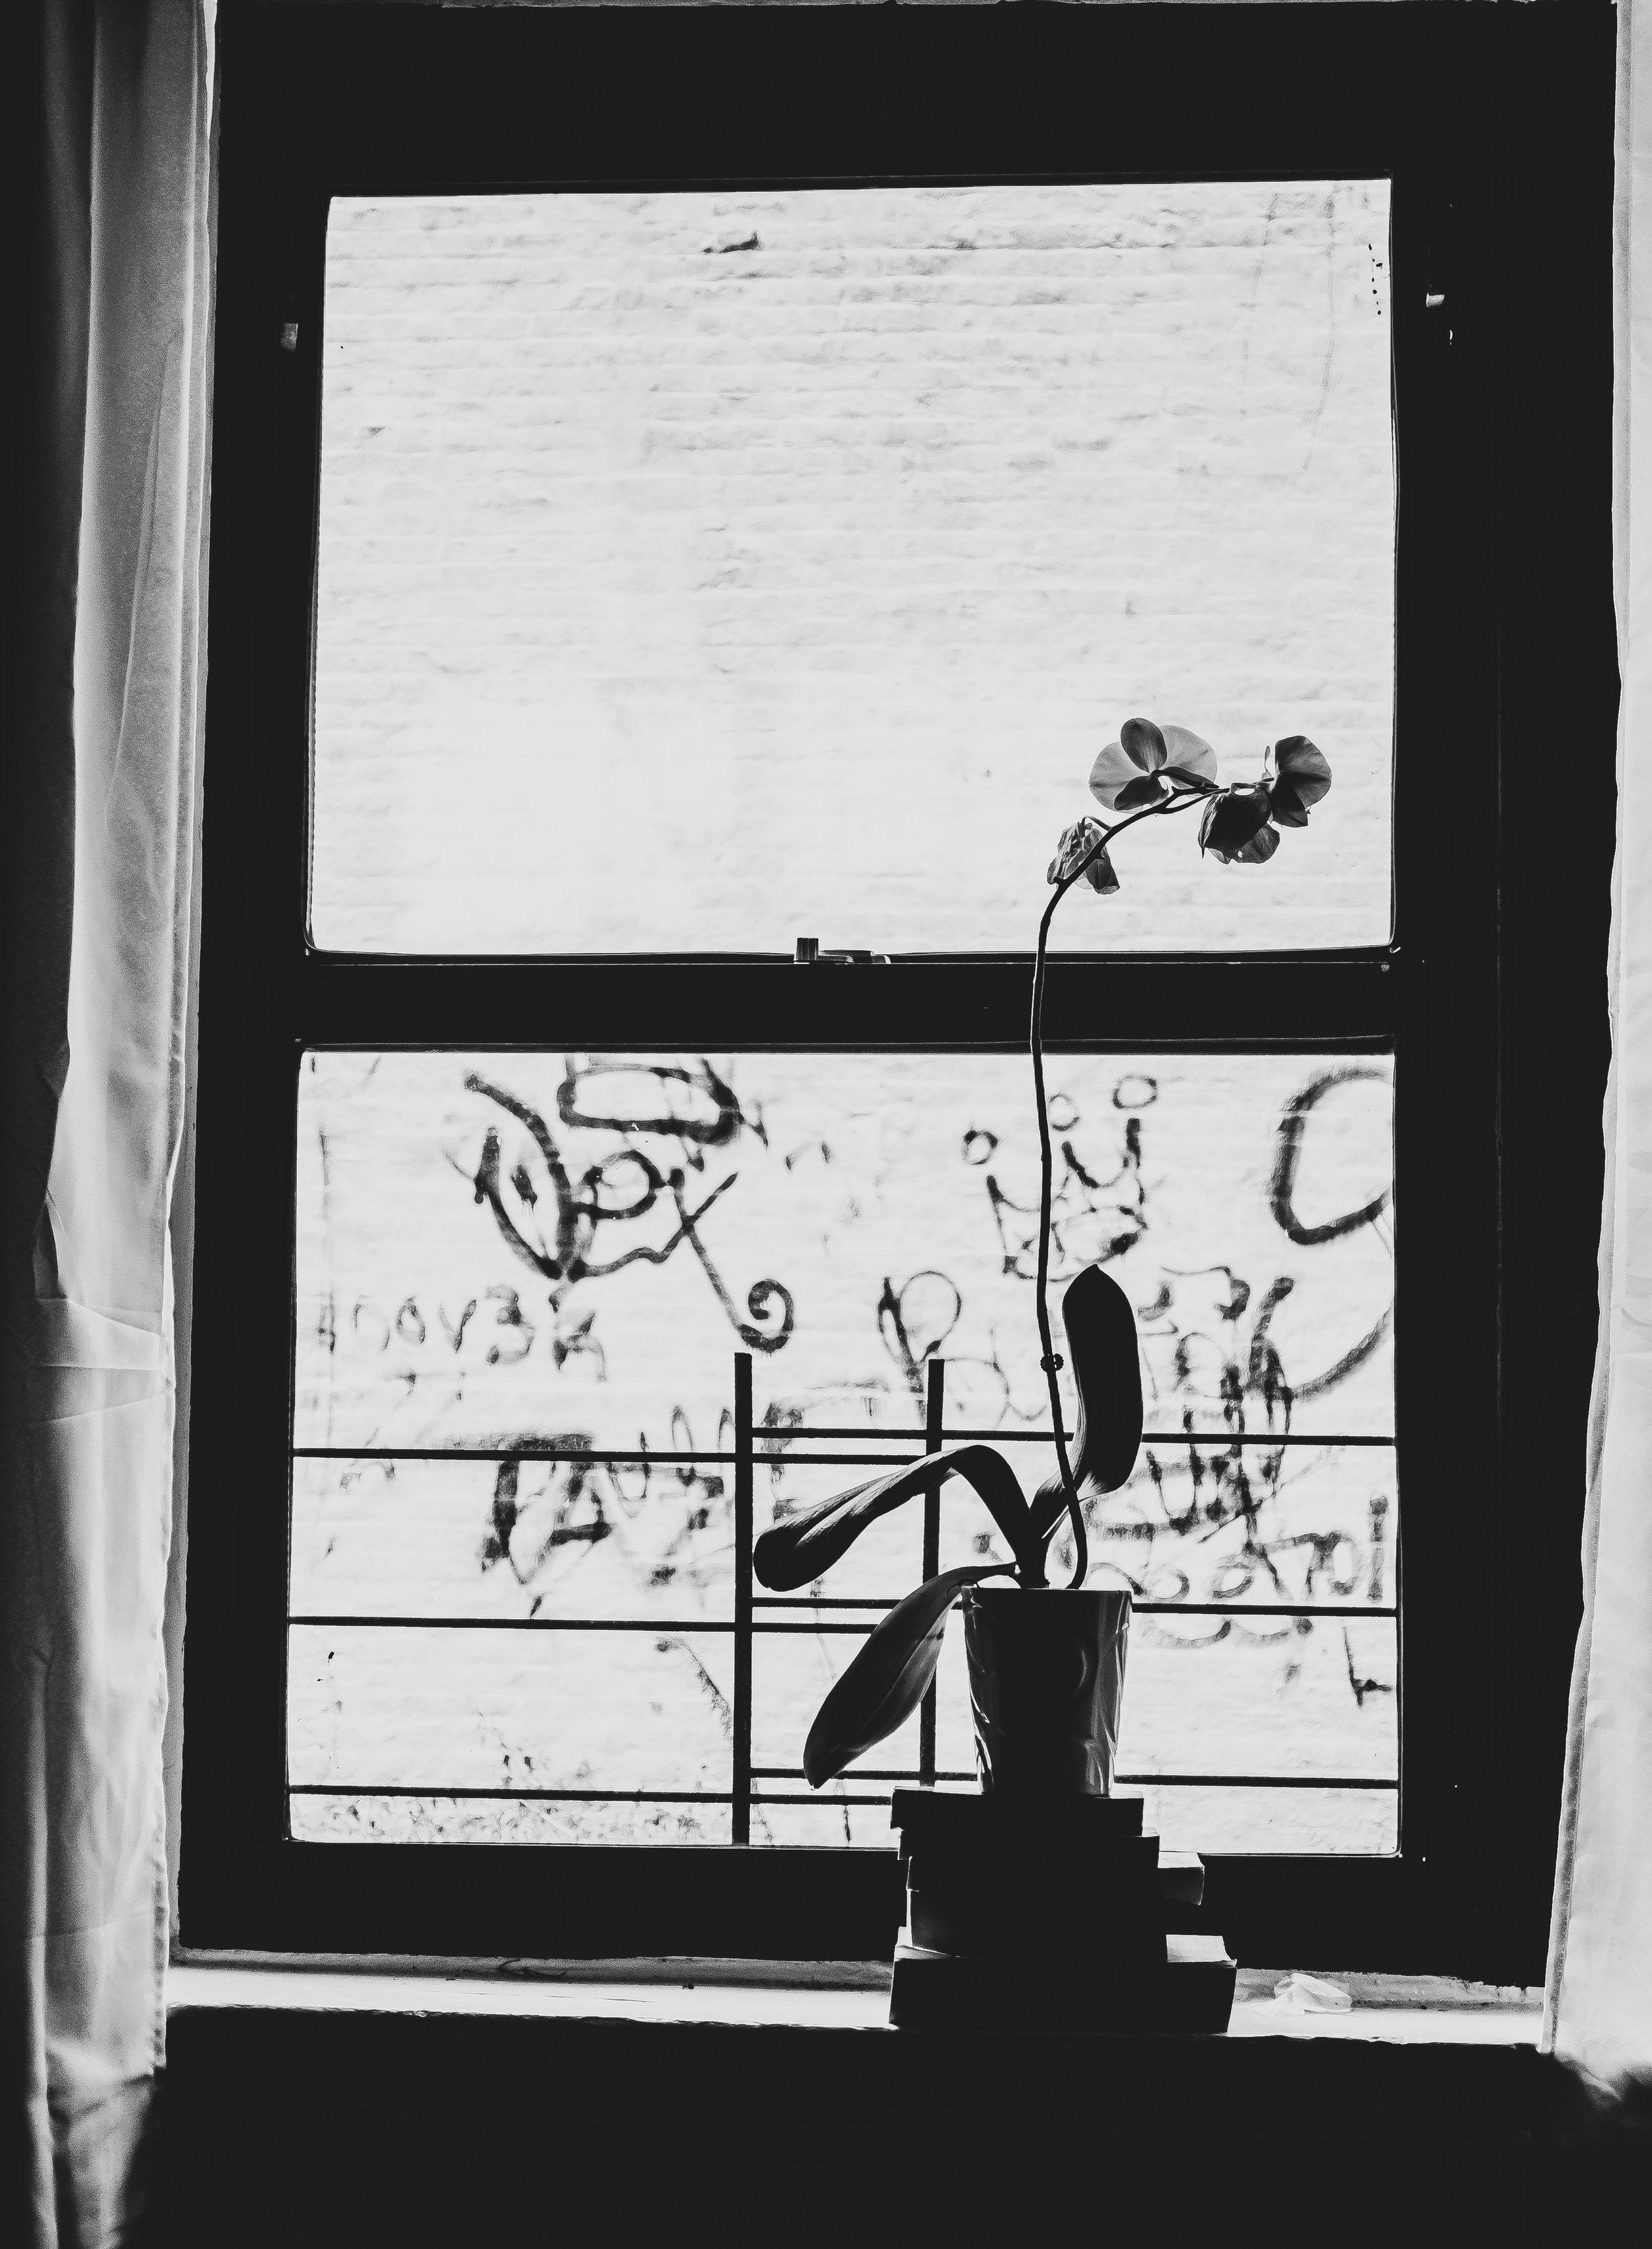 Day 20, Window -